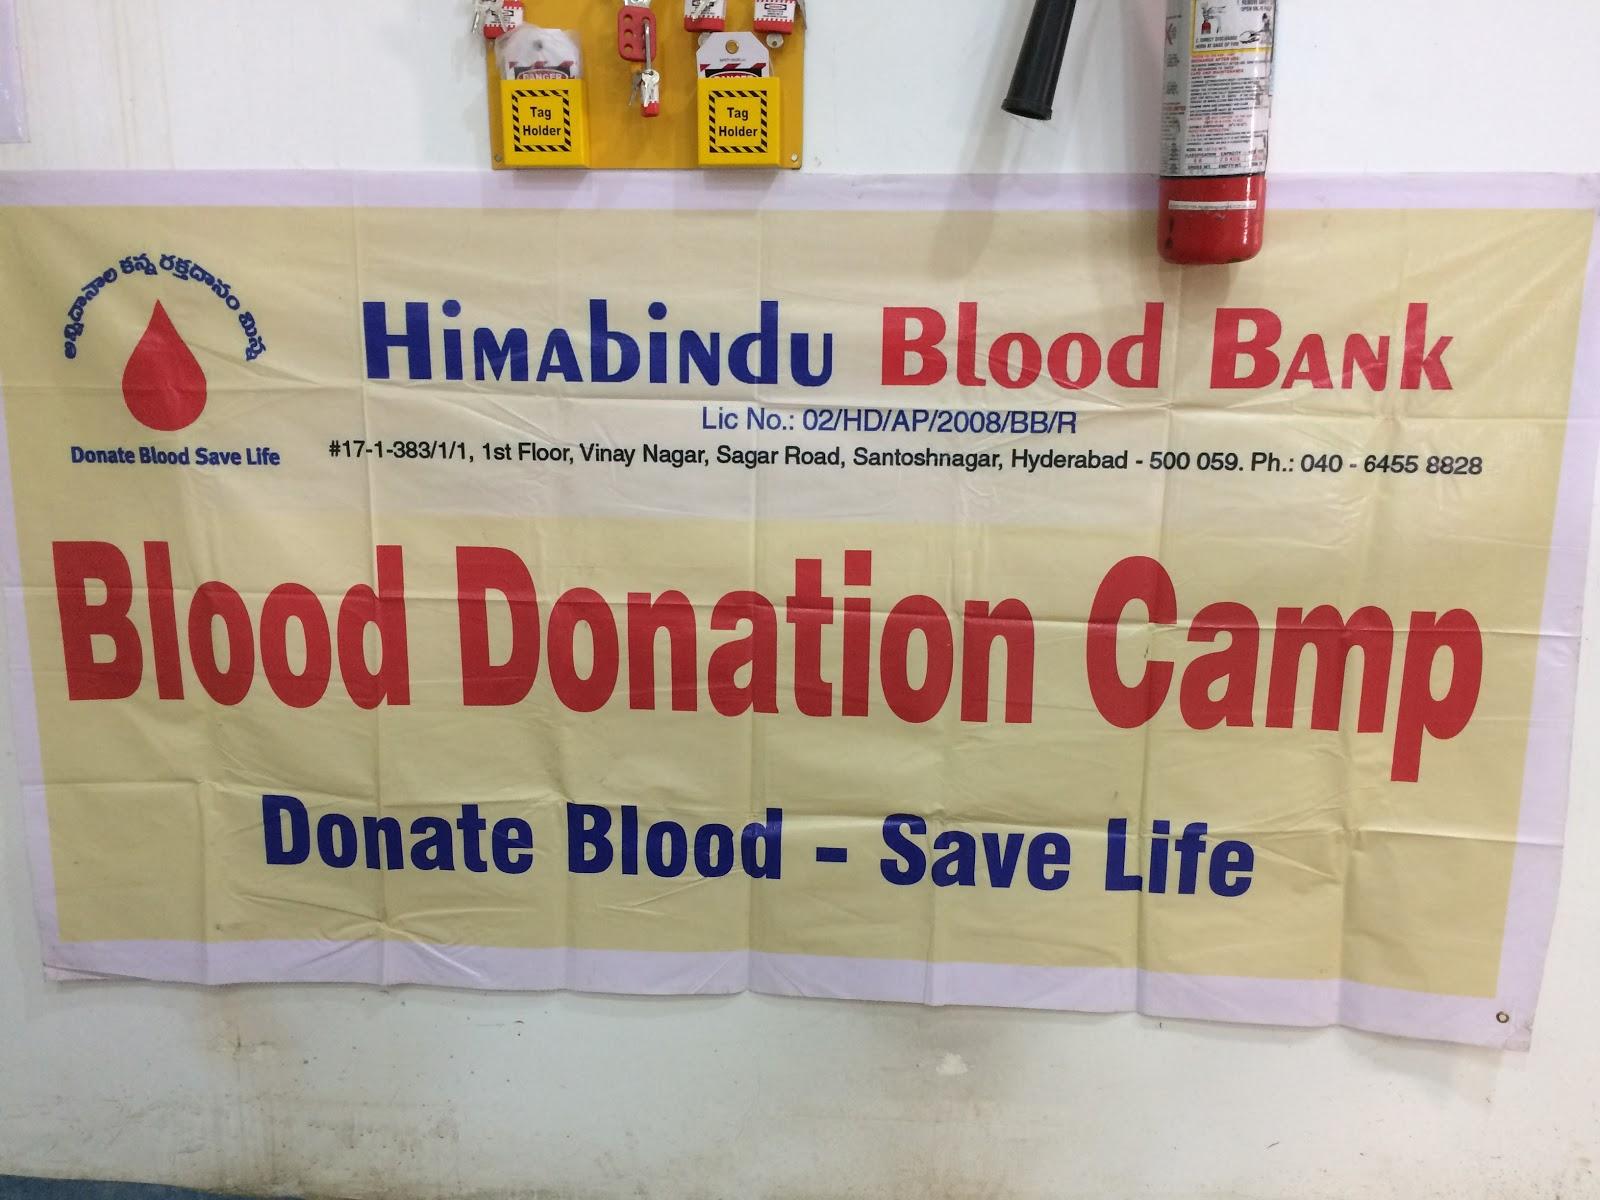 blood bank Himabindu blood bank near Hyderabad Telangana